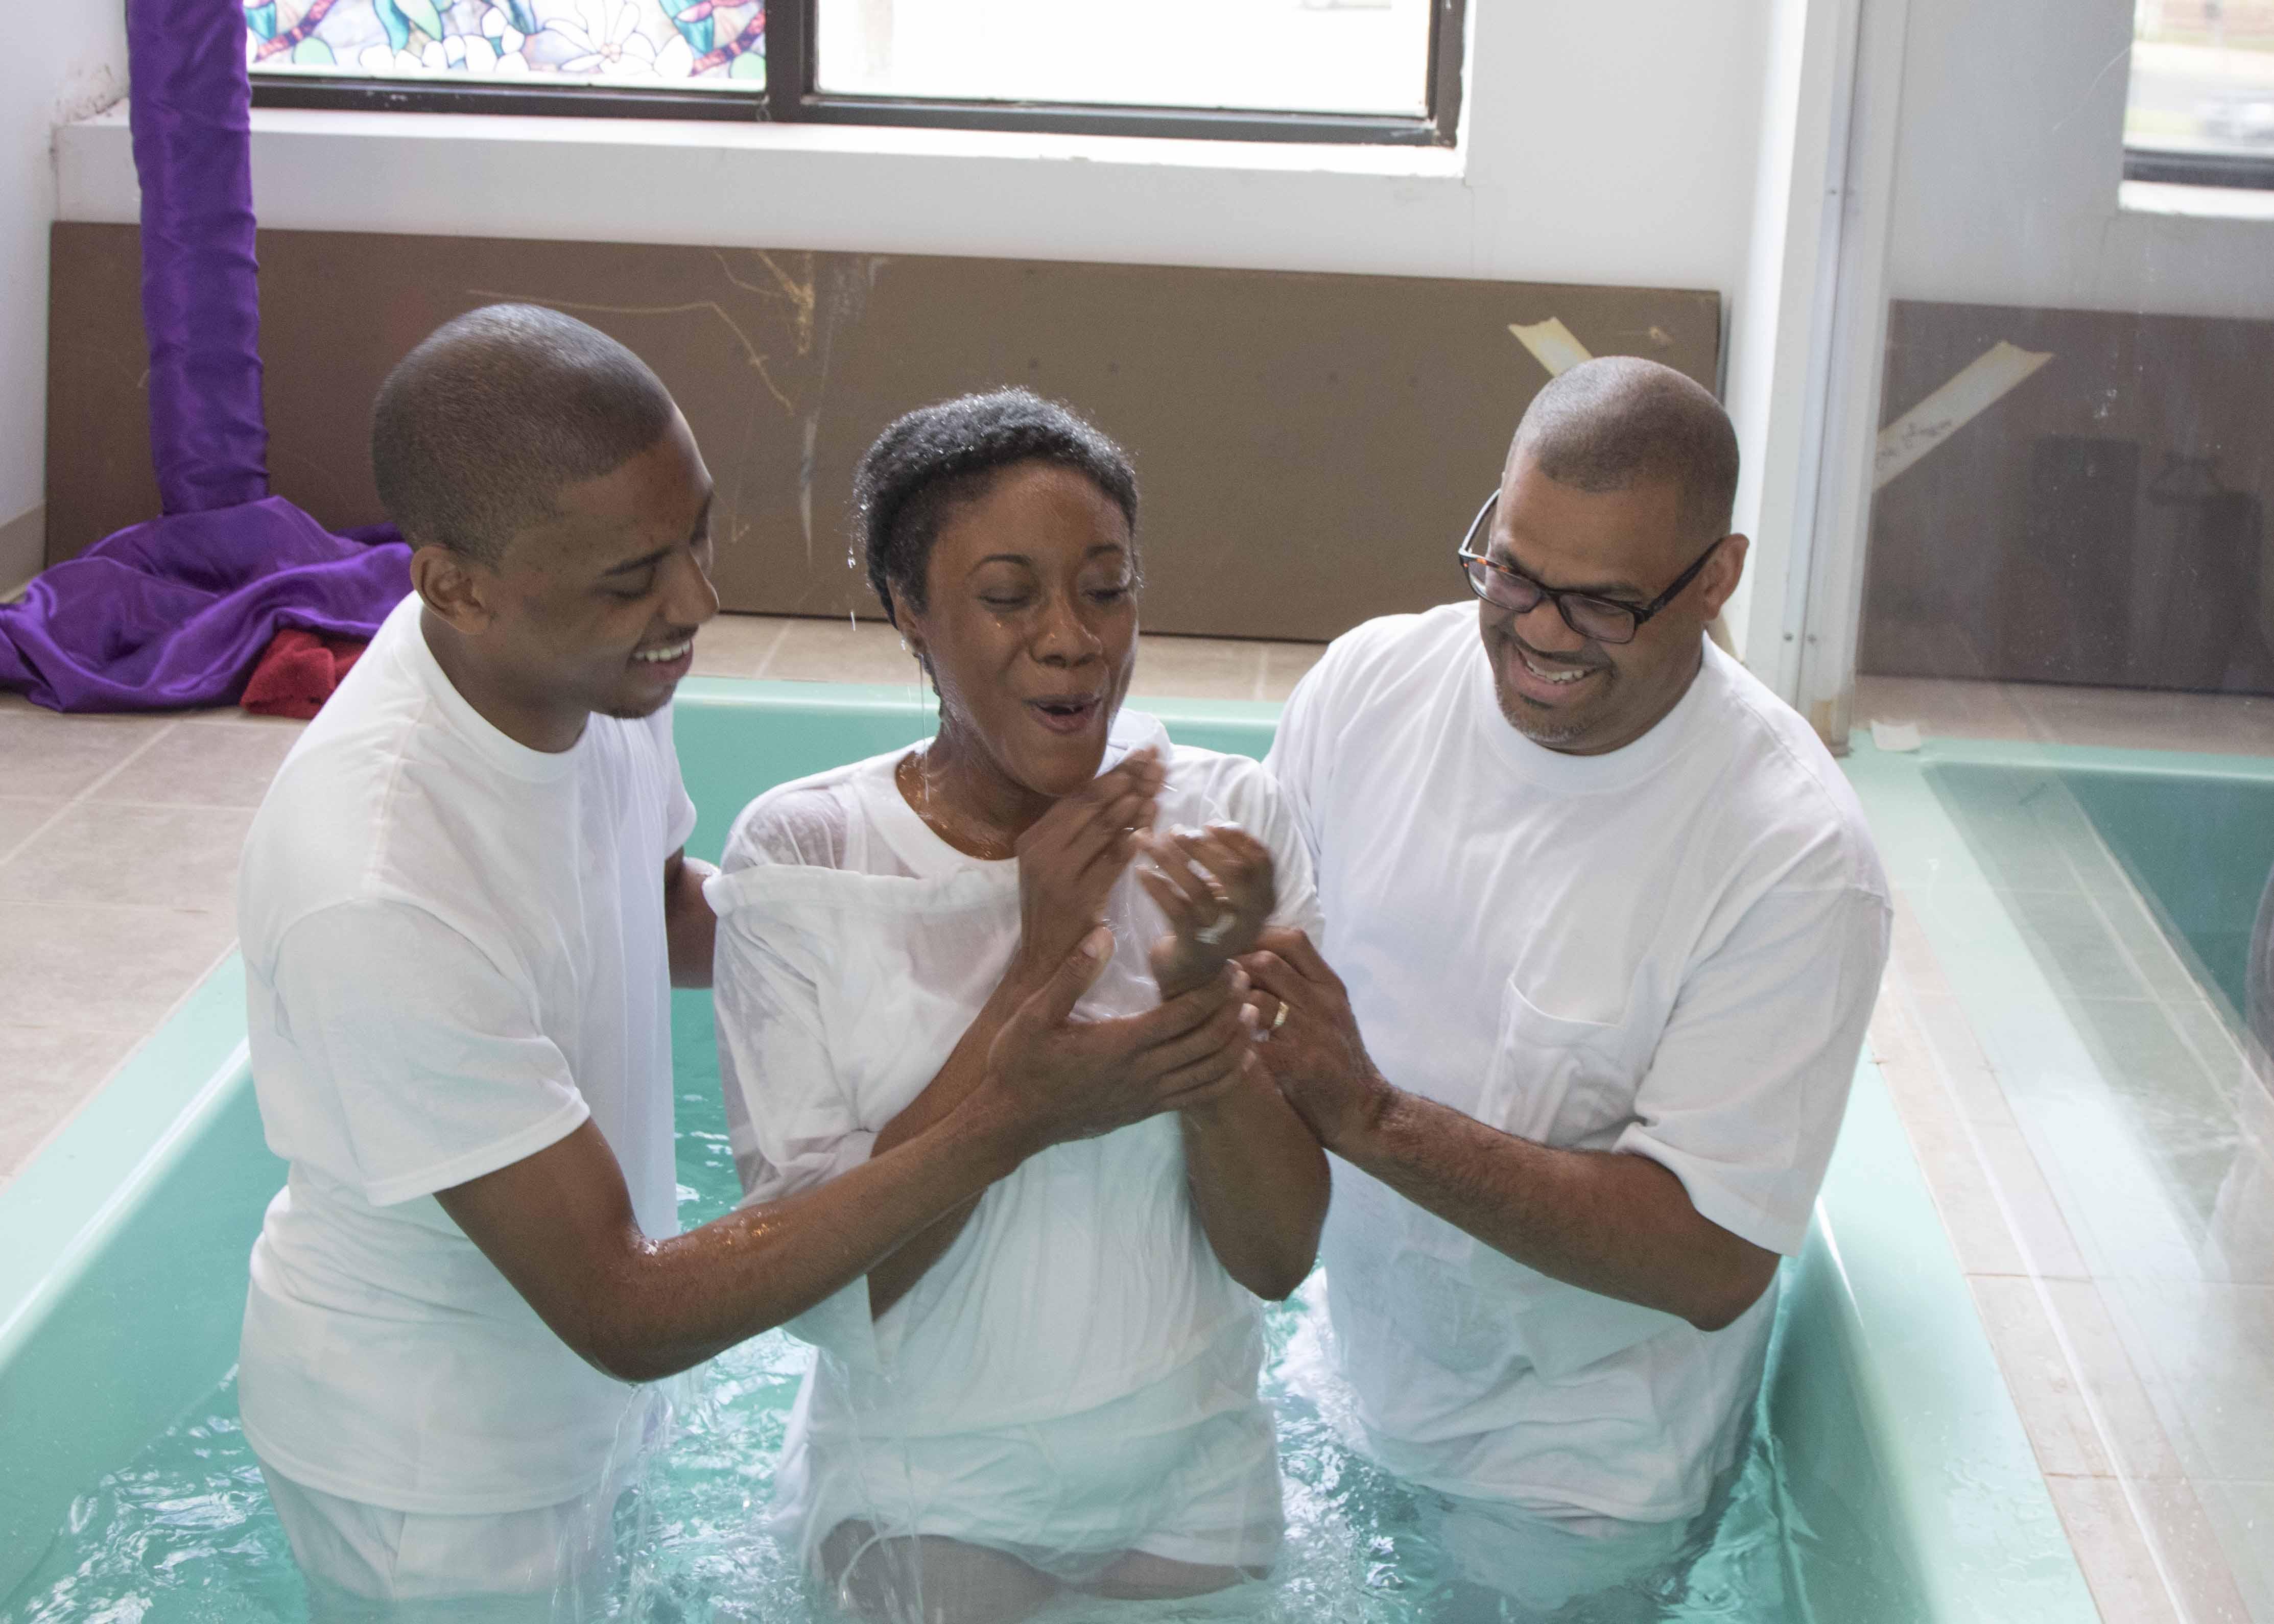 Baptism_05032015_0228.jpg